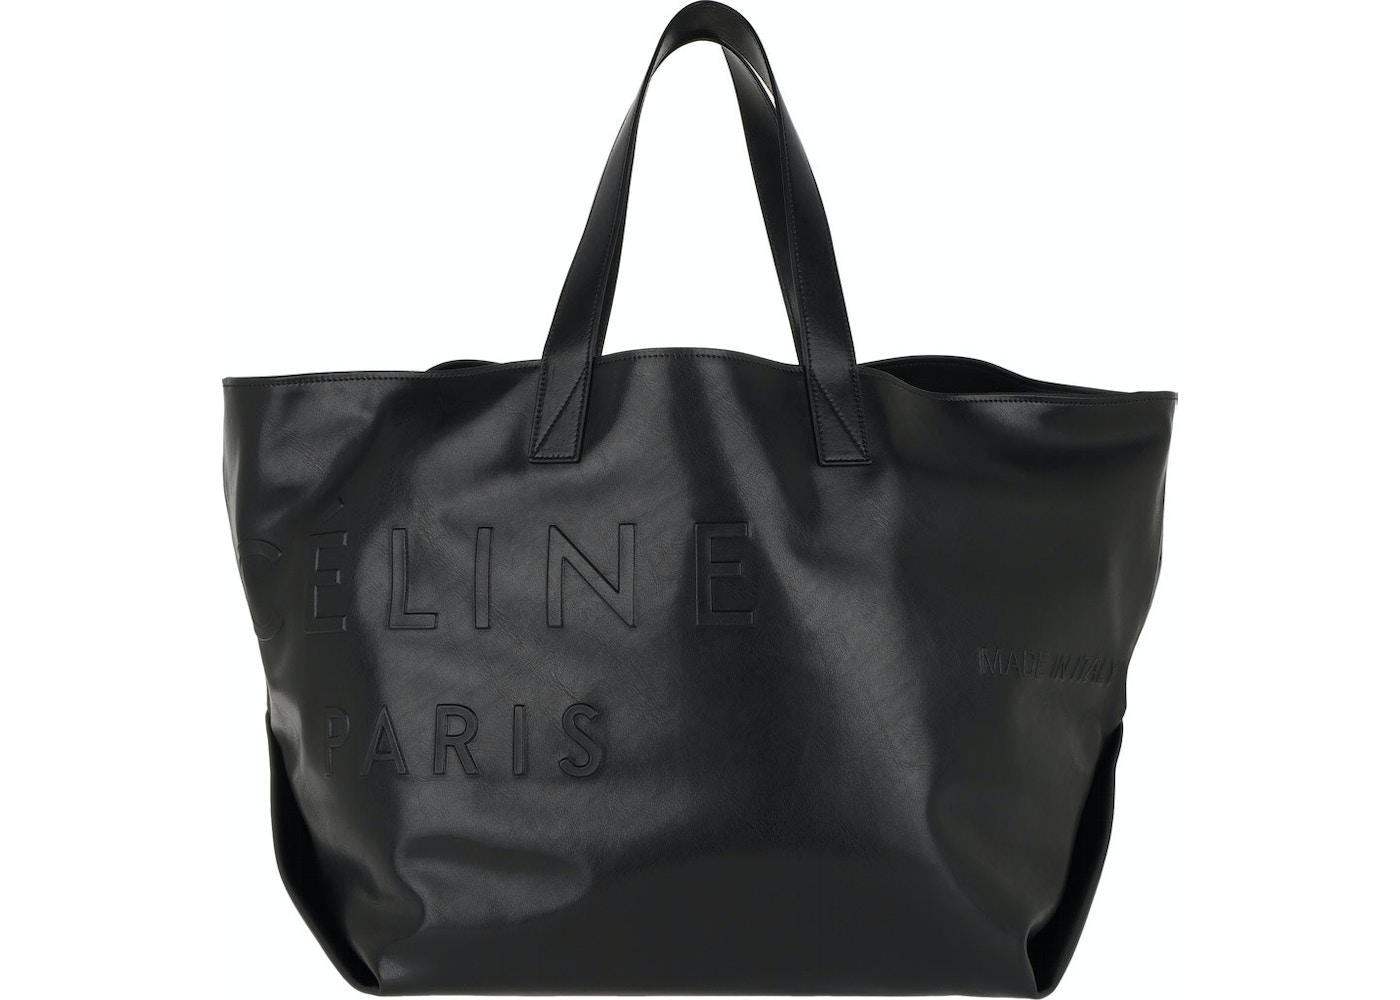 Buy   Sell Celine Handbags - Last Sale ca5aacee6fe4e